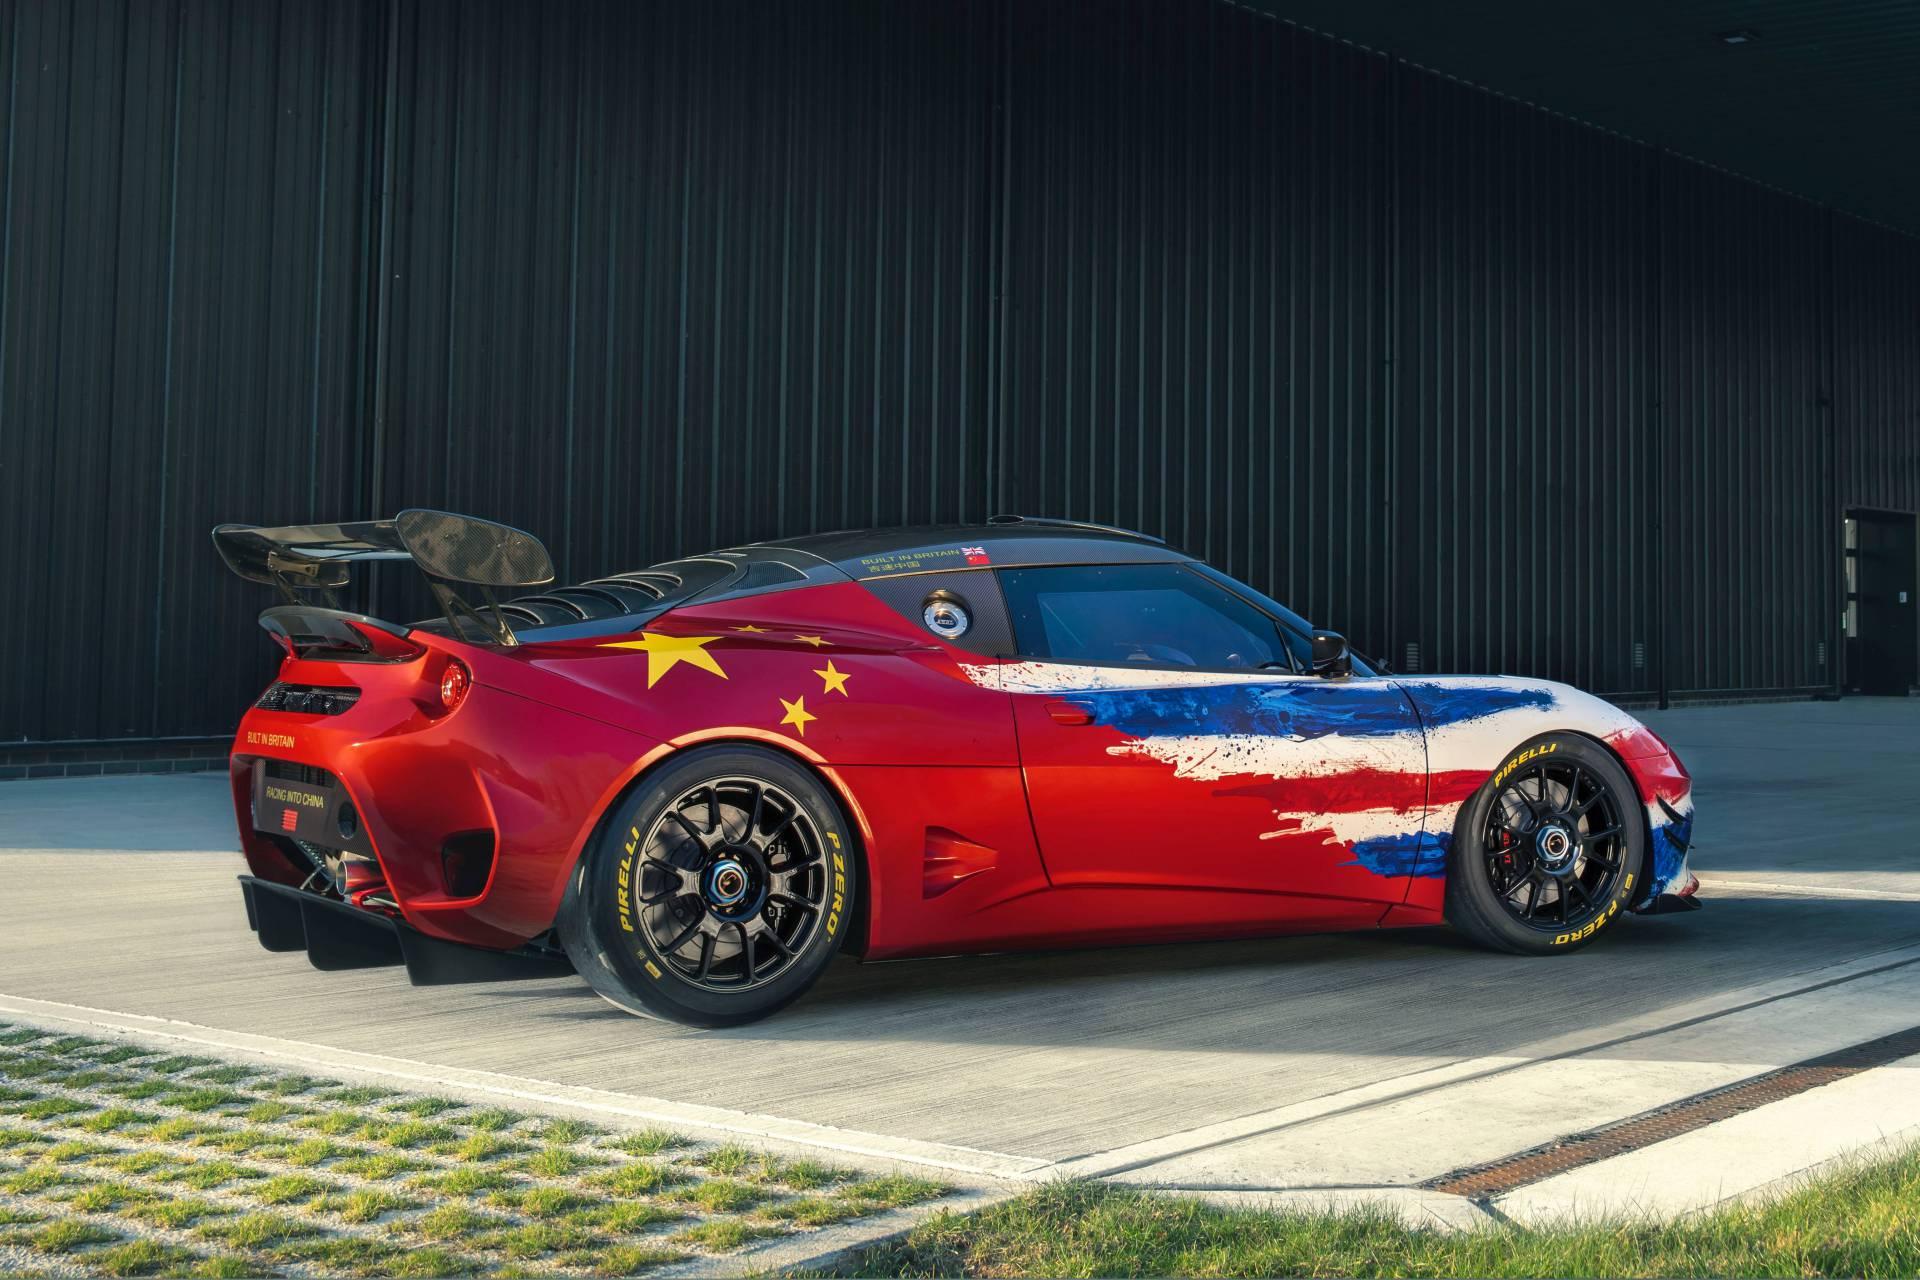 Lotus-Evora-GT4-Concept-9